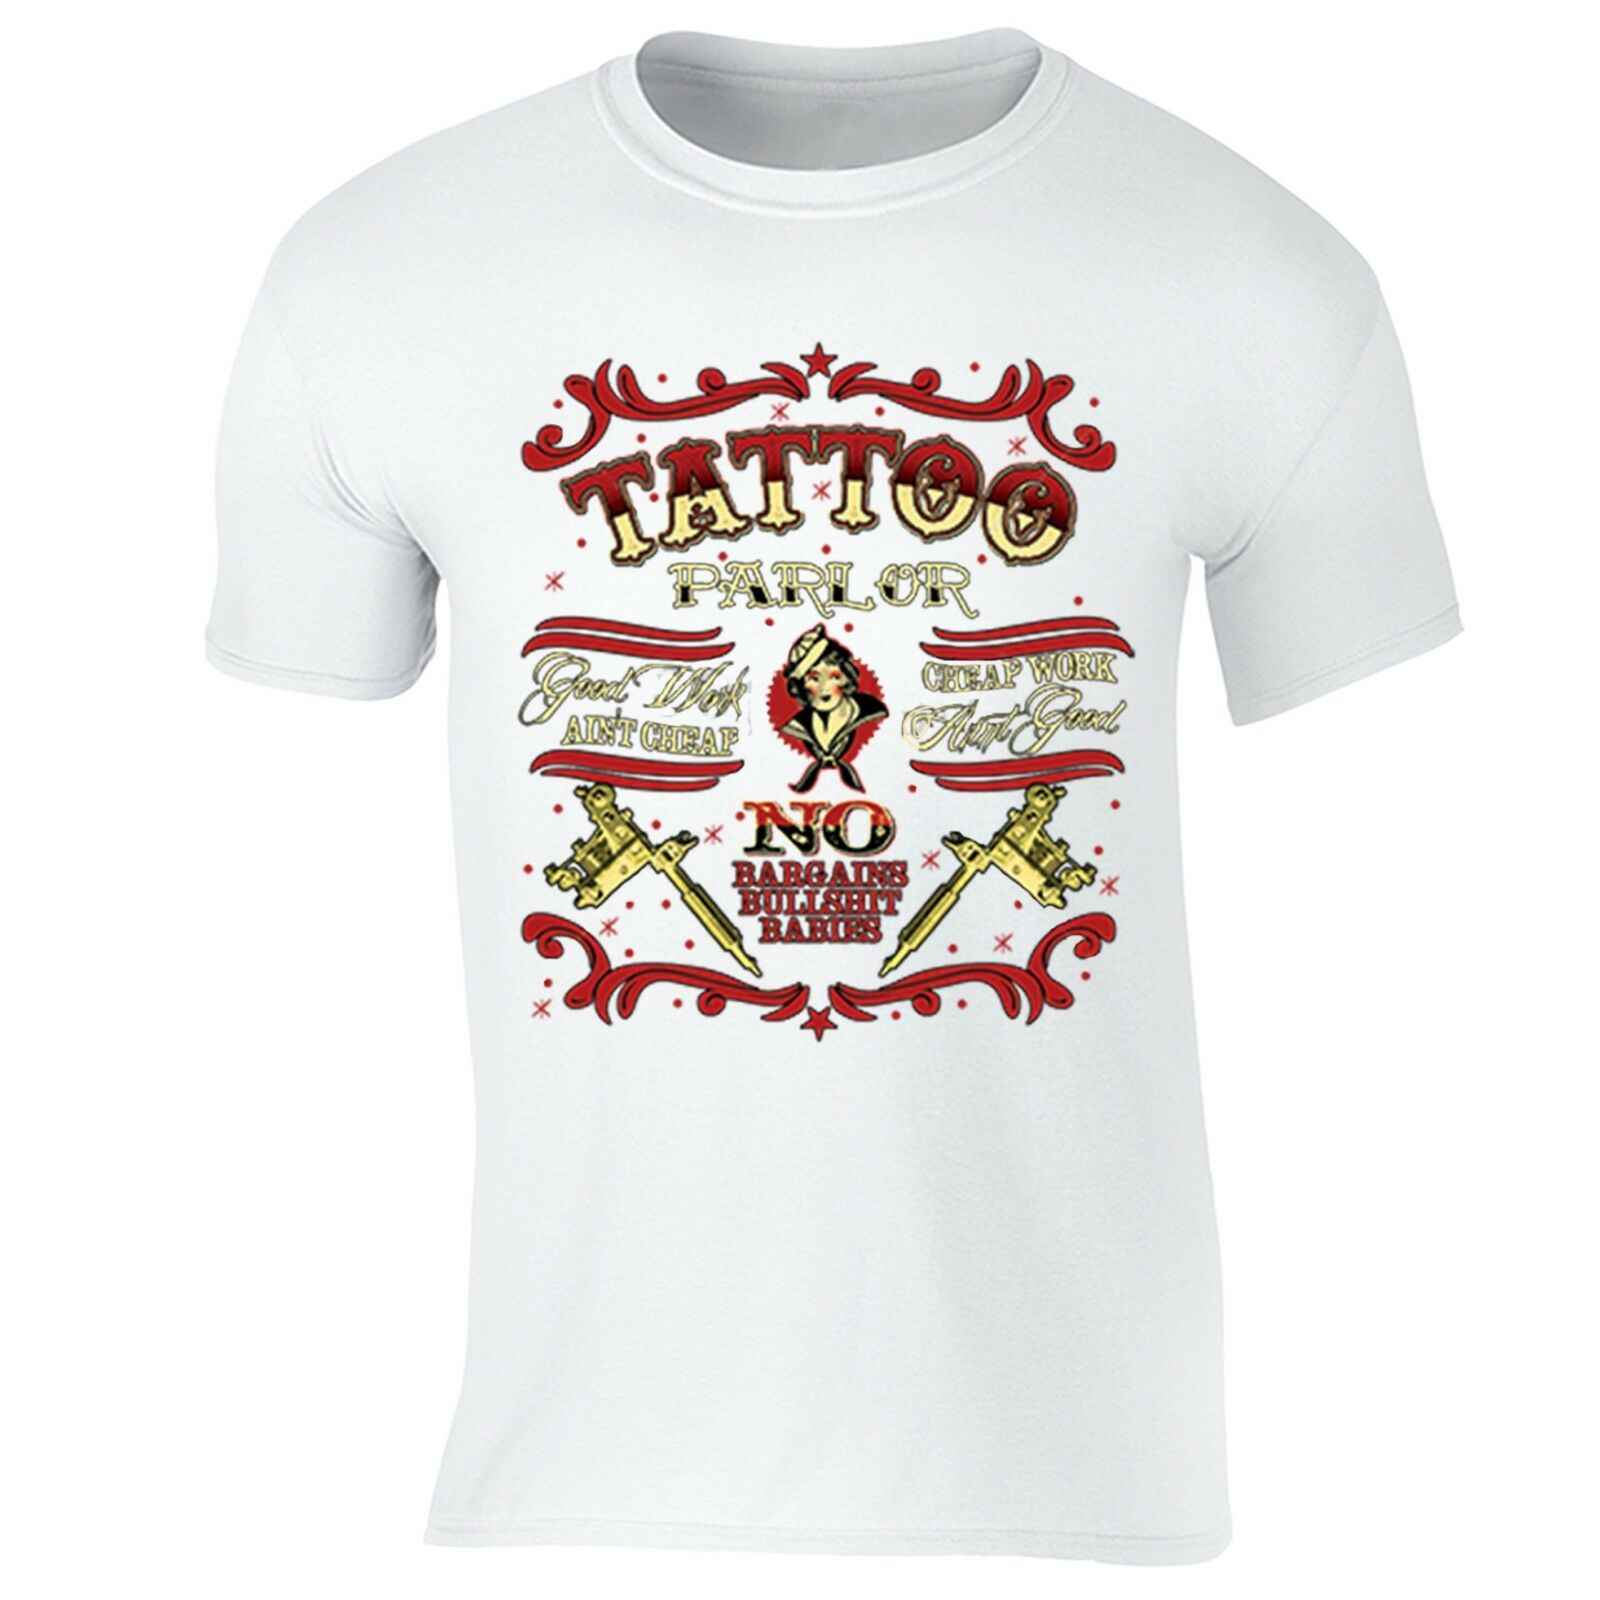 Татуировка салон футболка боди арт хорошая работа баргаинс бульдог * t художника Inked футболка